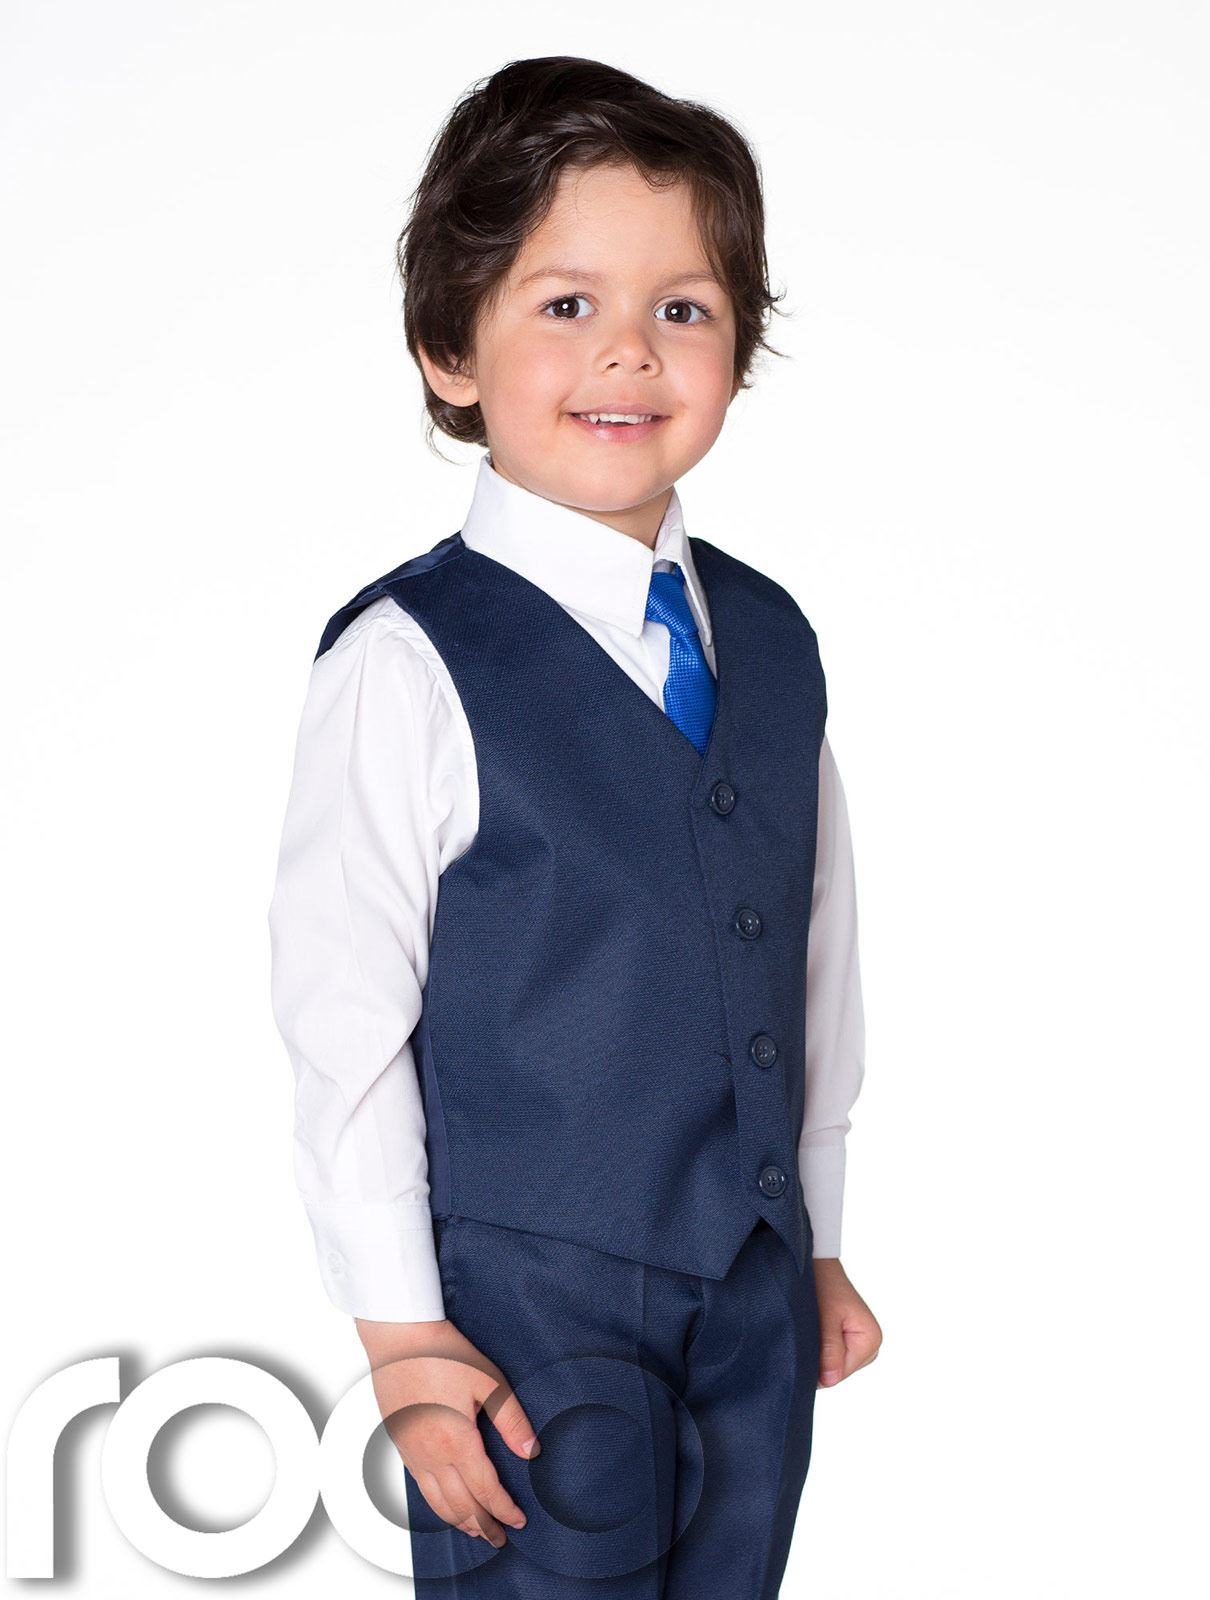 34383ef98b5f Detalles de Traje Ceremonia Niño, Chaleco para Niño Azul Marino, Gris,